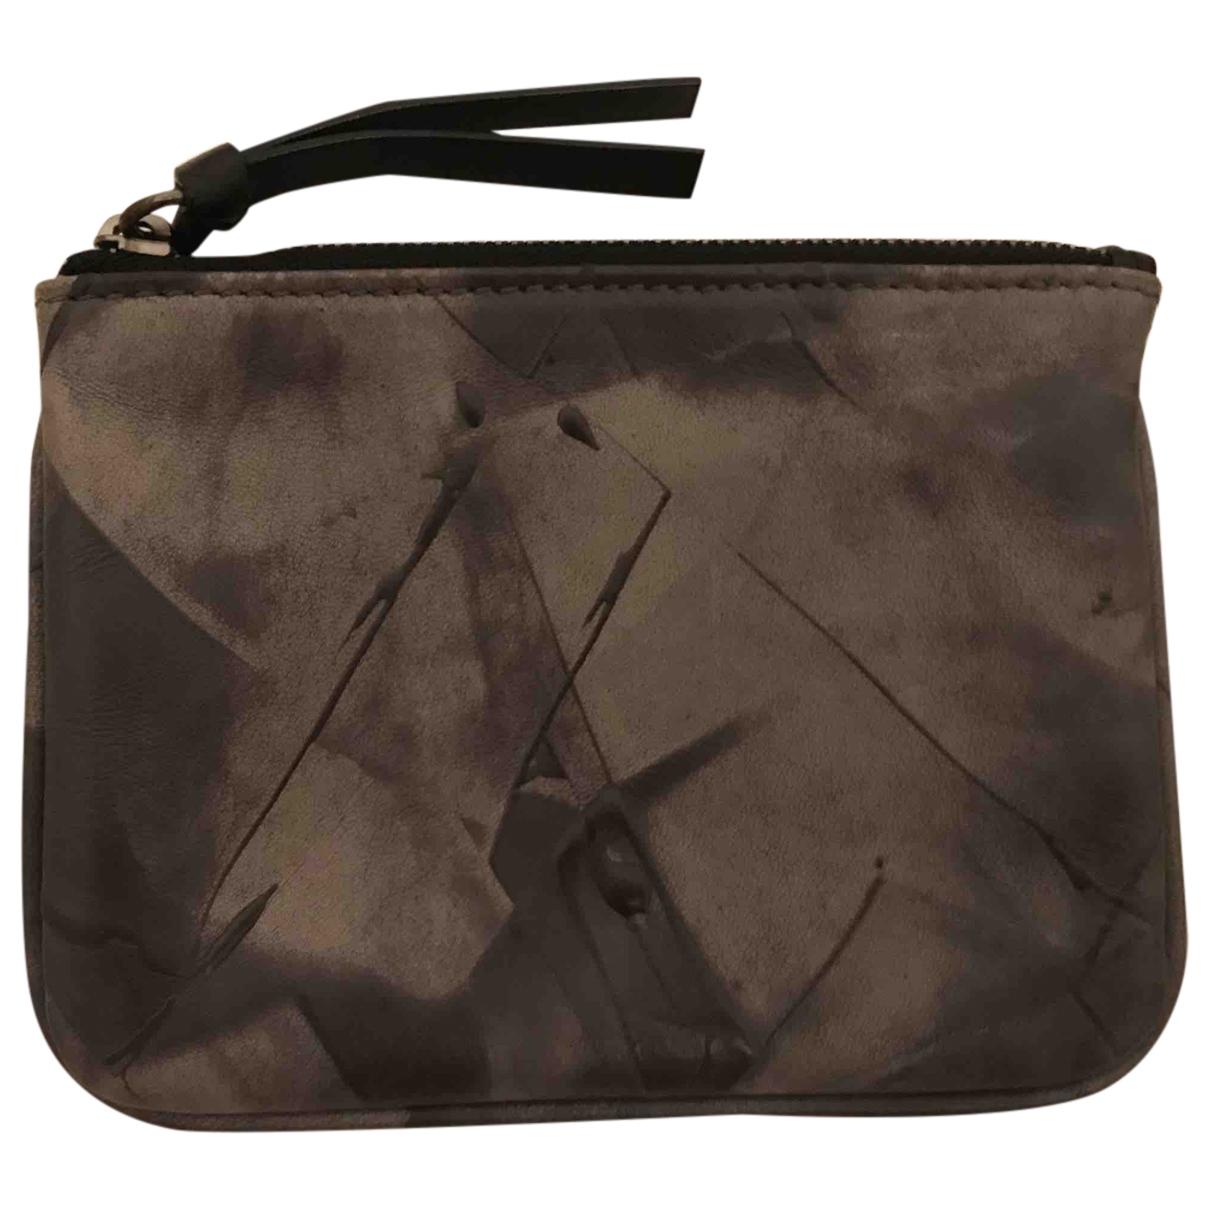 Givenchy - Petite maroquinerie   pour homme en cuir - anthracite